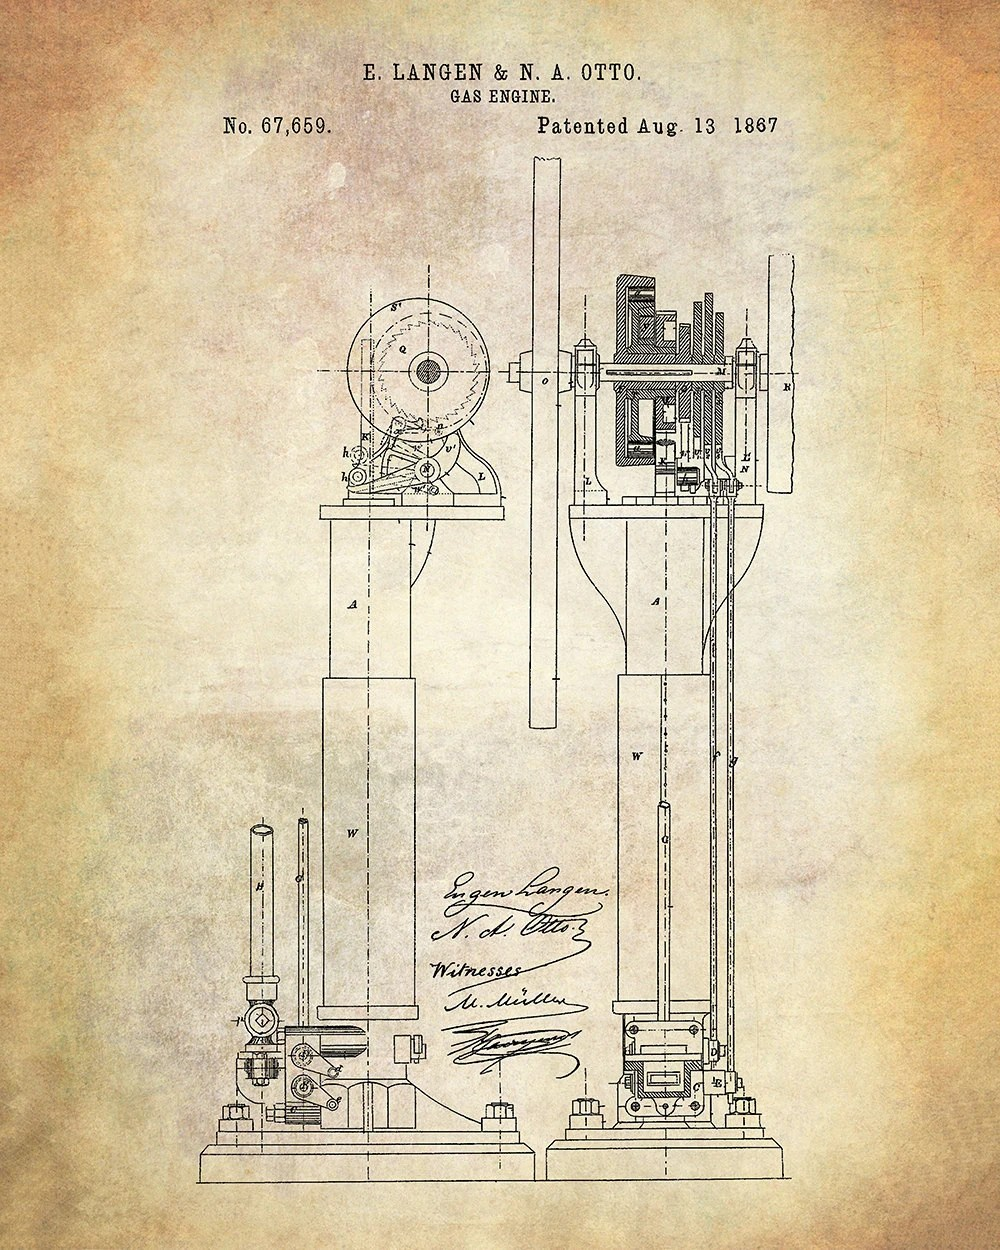 hight resolution of langen otto improvements in air engines patent art print langen otto patent print gas engine patent print internal combustion engine